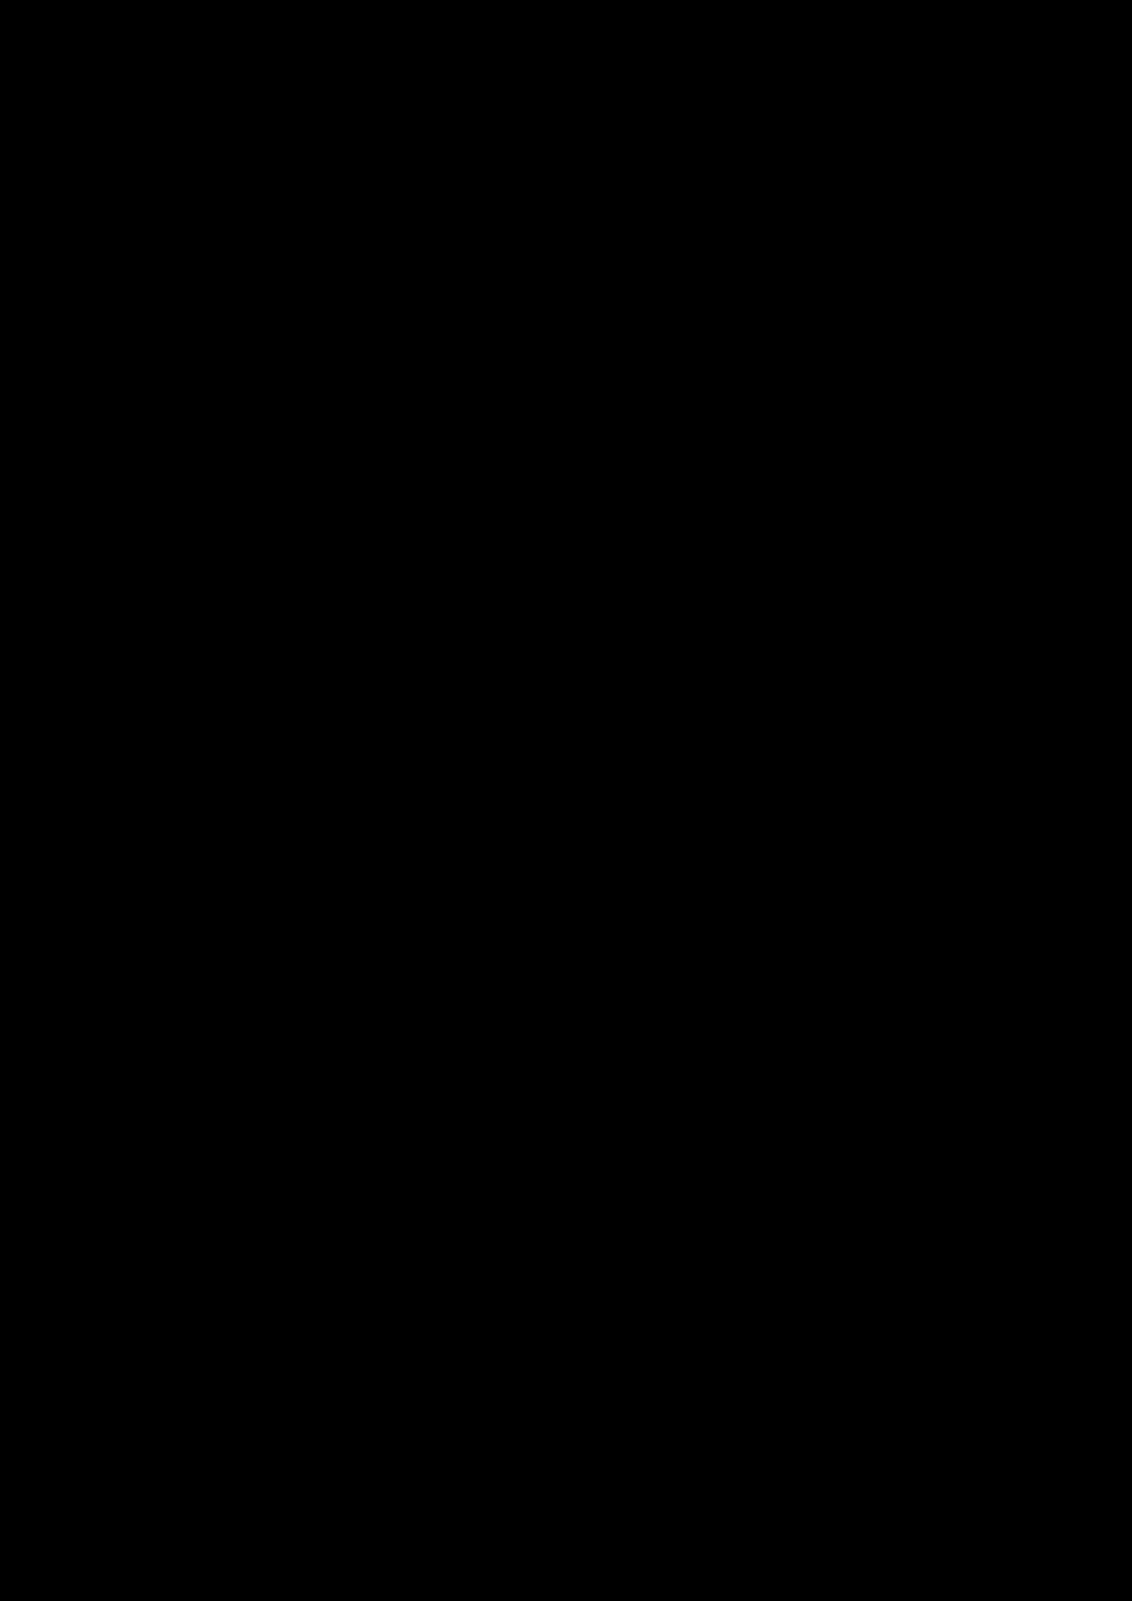 Korolevstvo slez slide, Image 60